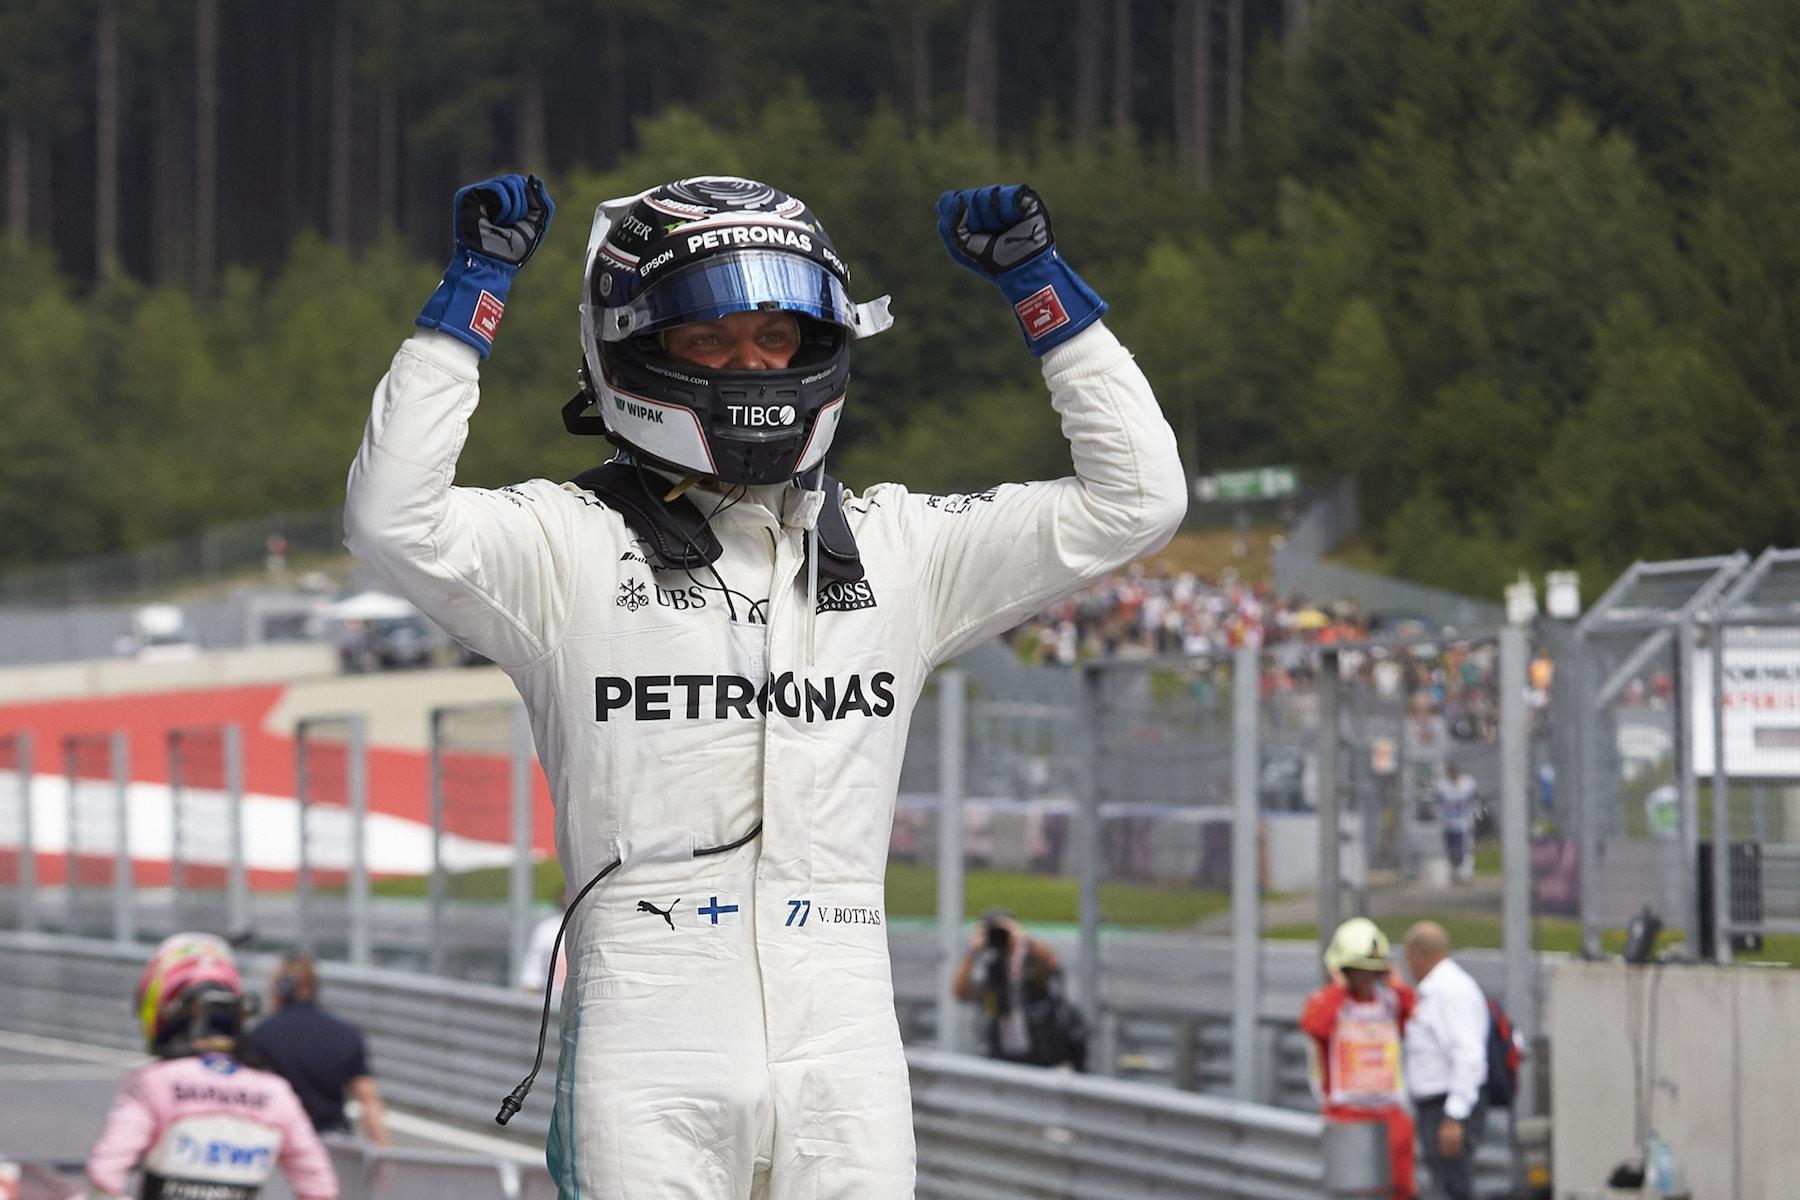 X 2017 Valtteri Bottas | Mercedes W08 | 2017 Austrian GP winner 4 copy.JPG